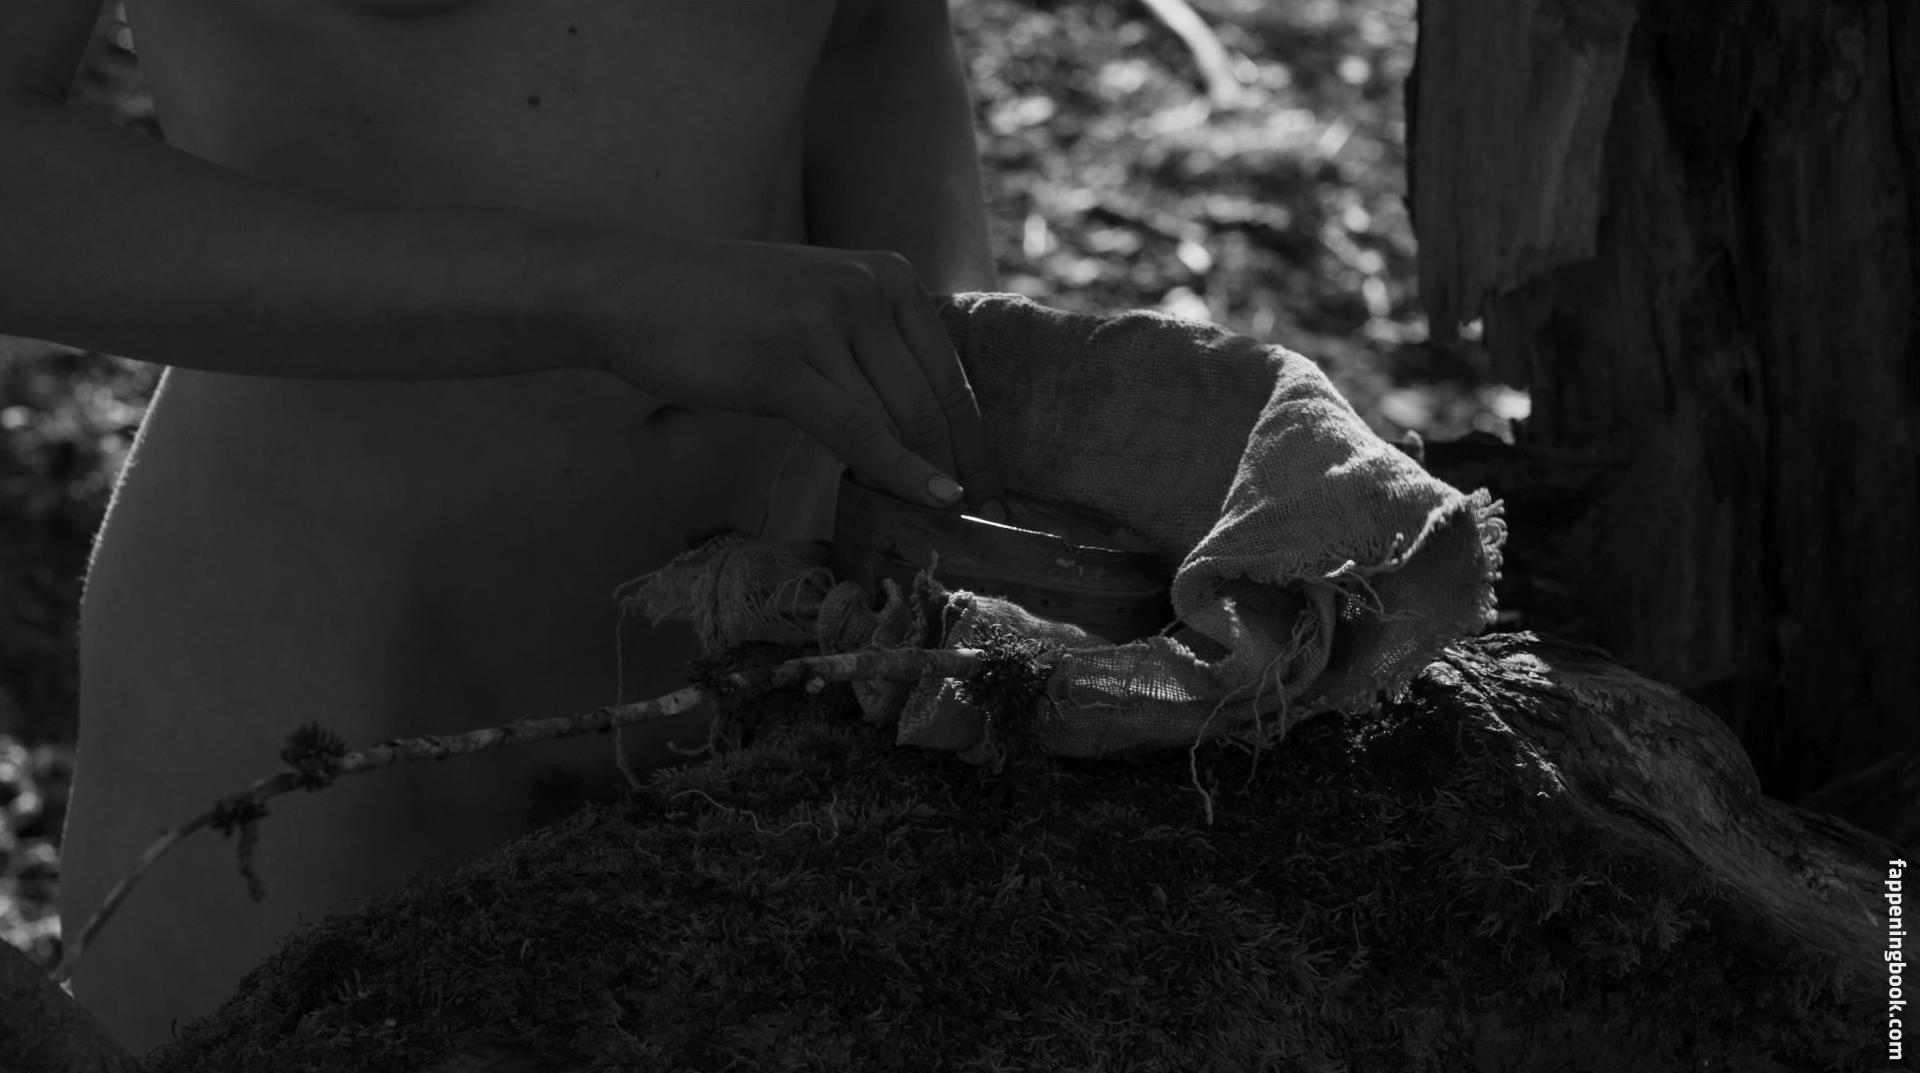 Ana Walczak Nude rea lest nude, sexy, the fappening, uncensored - photo